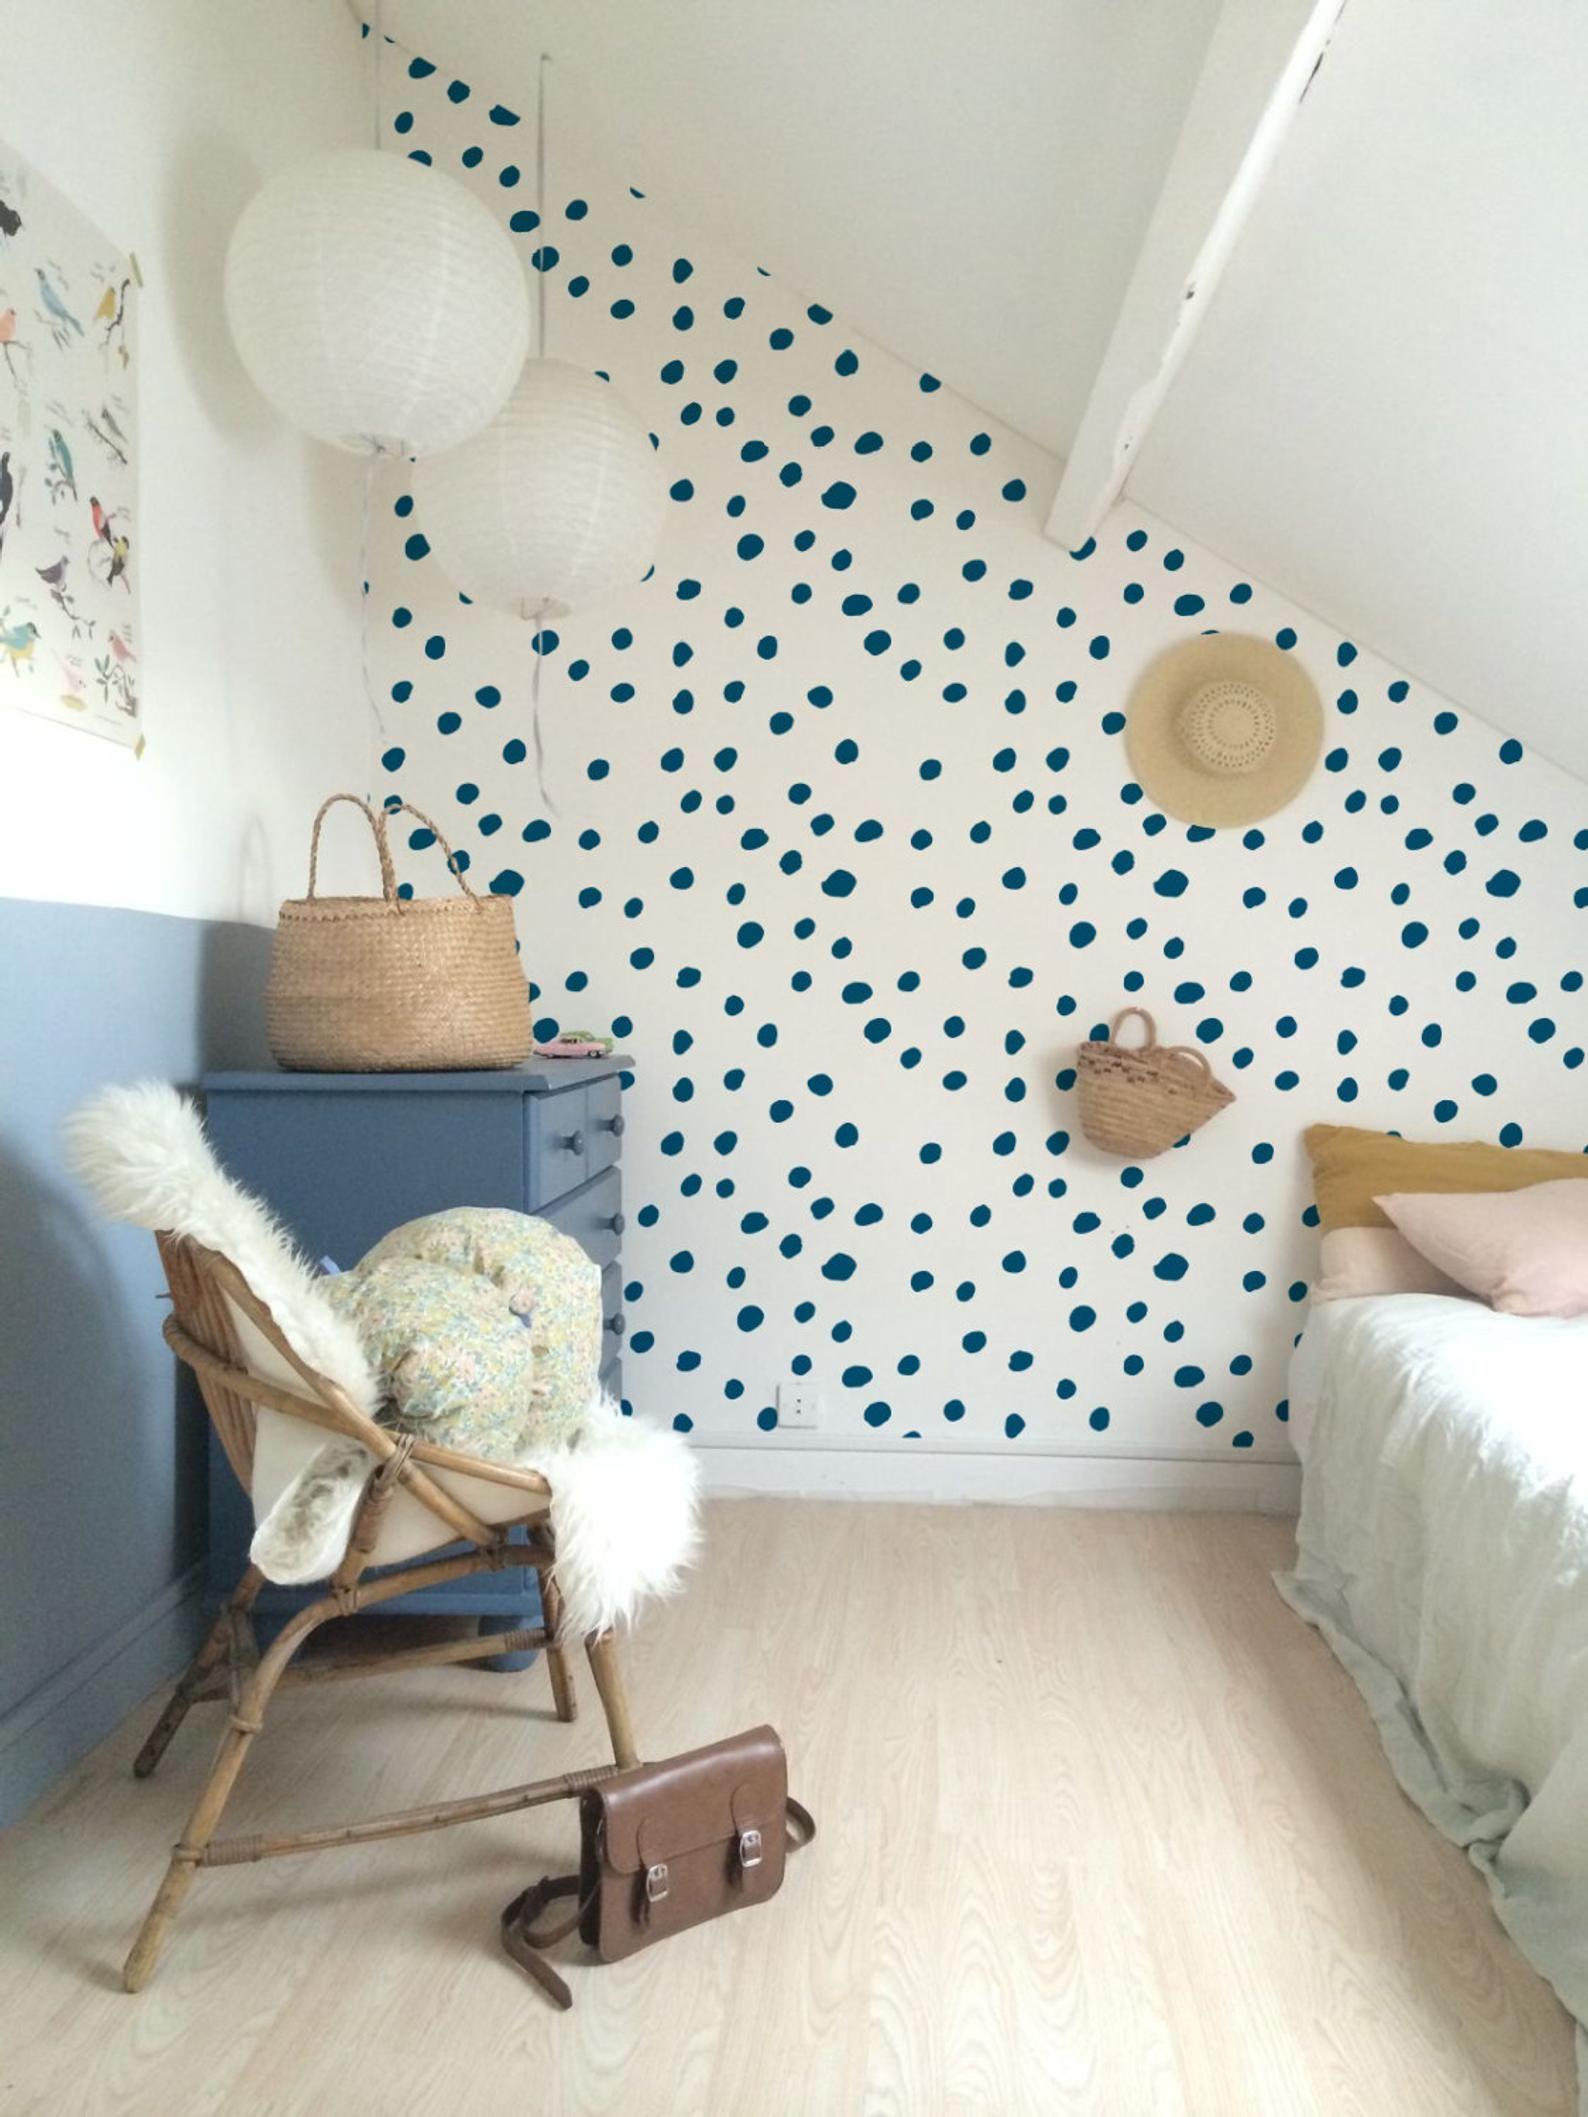 Self Adhesive Vinyl Temporary Removable Wallpaper Wall Decal Etsy Removable Wallpaper Wall Wallpaper Home Decor